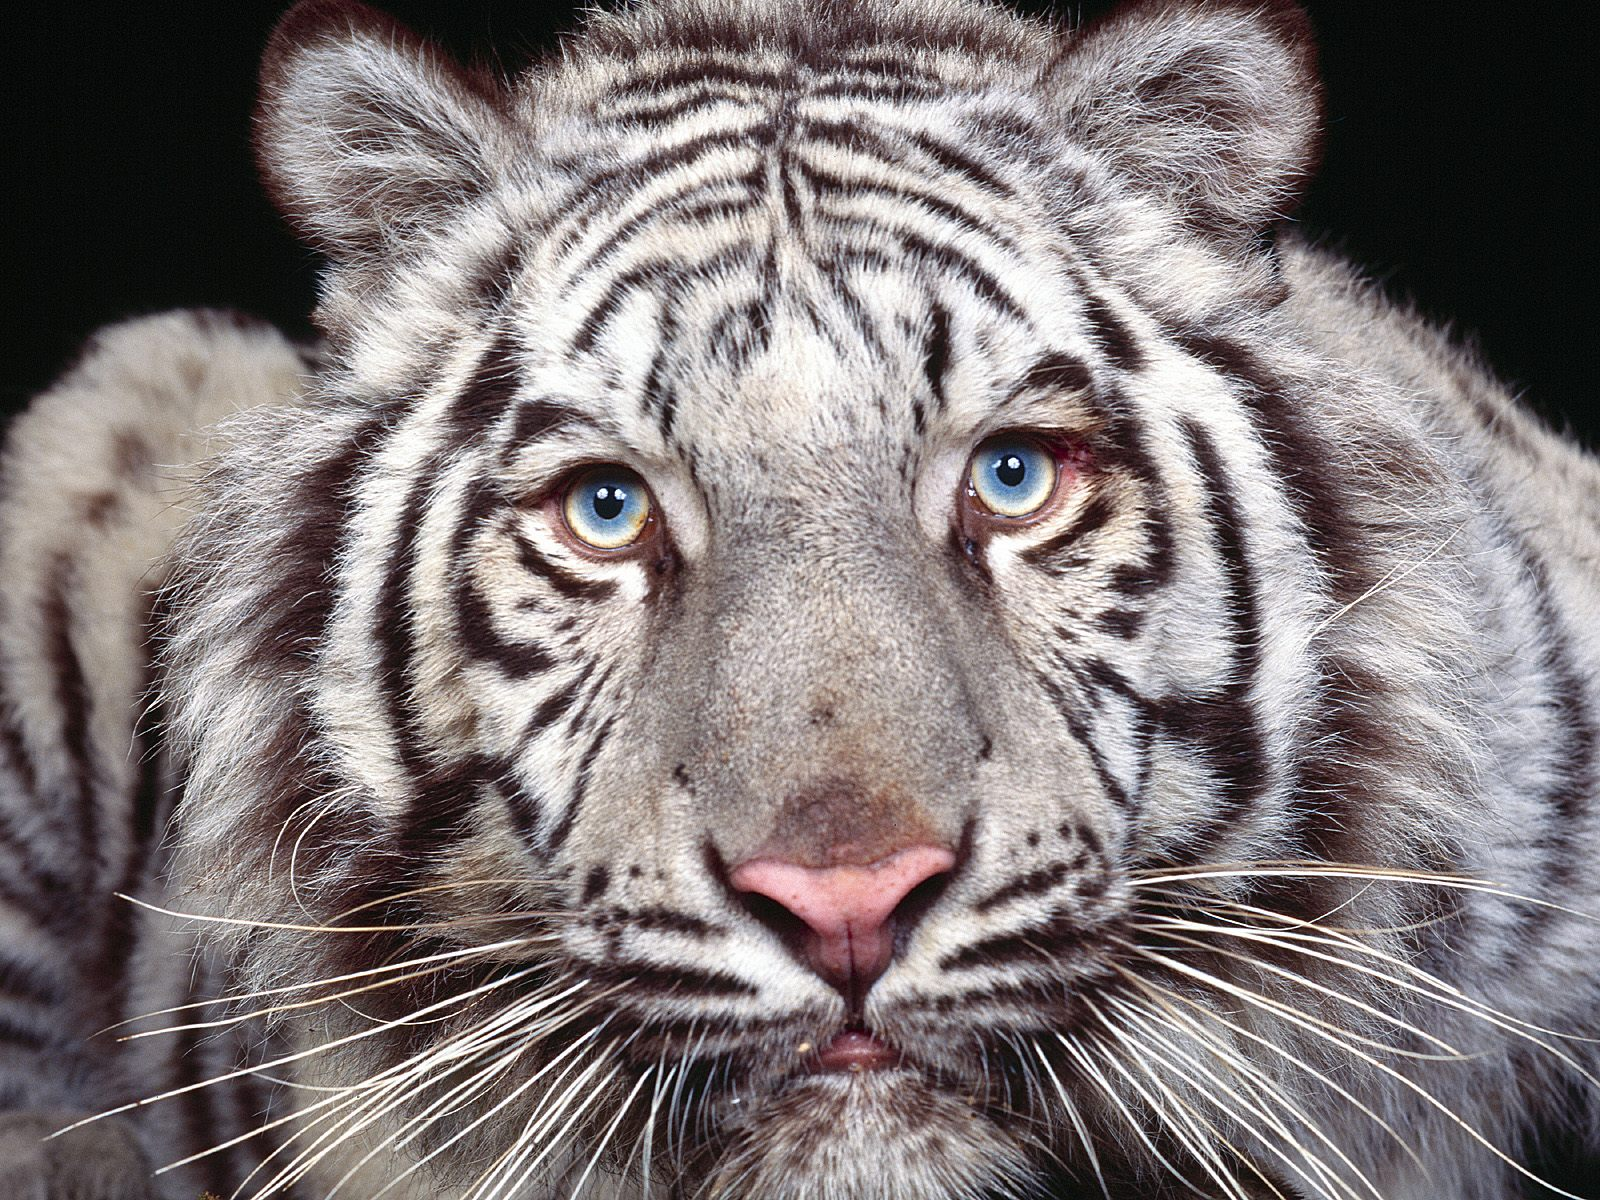 http://4.bp.blogspot.com/-ojV4feruSG8/T3yowkn5YsI/AAAAAAAAAks/5hCLrLeH5aE/s1600/blue+eyes+tiger.jpg